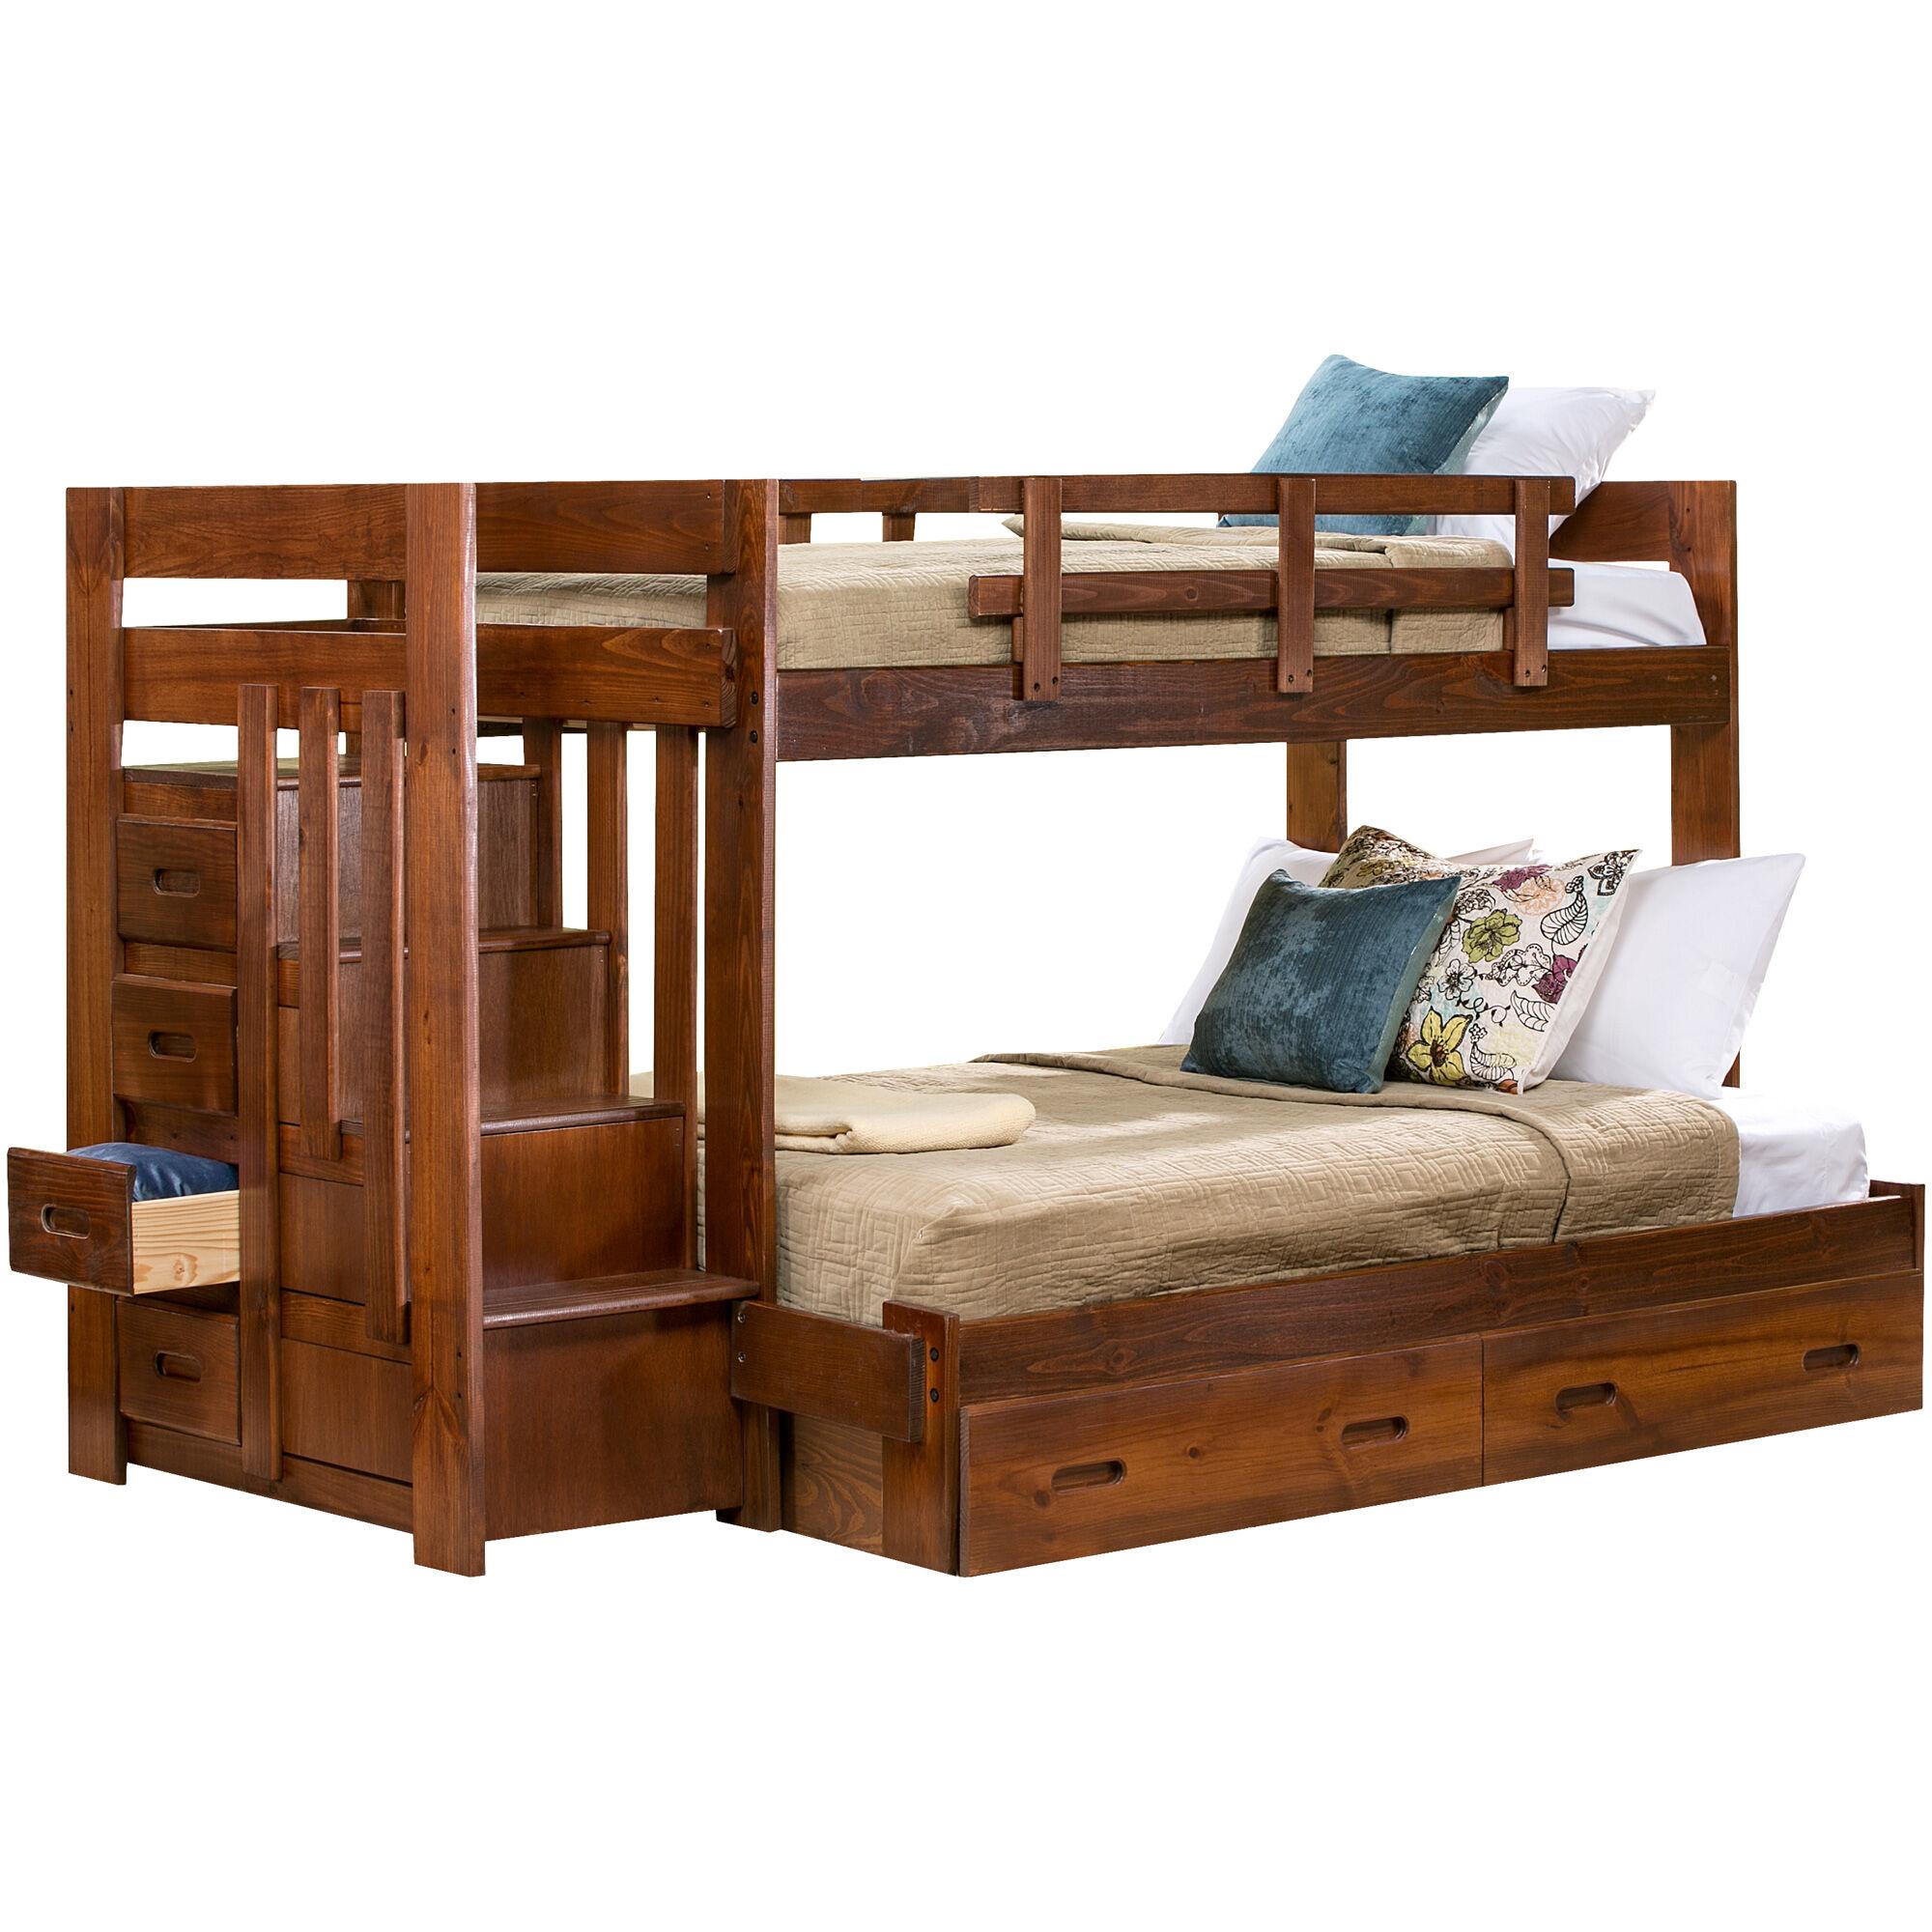 Slumberland Furniture Tanglewood Choc TWFL Stair